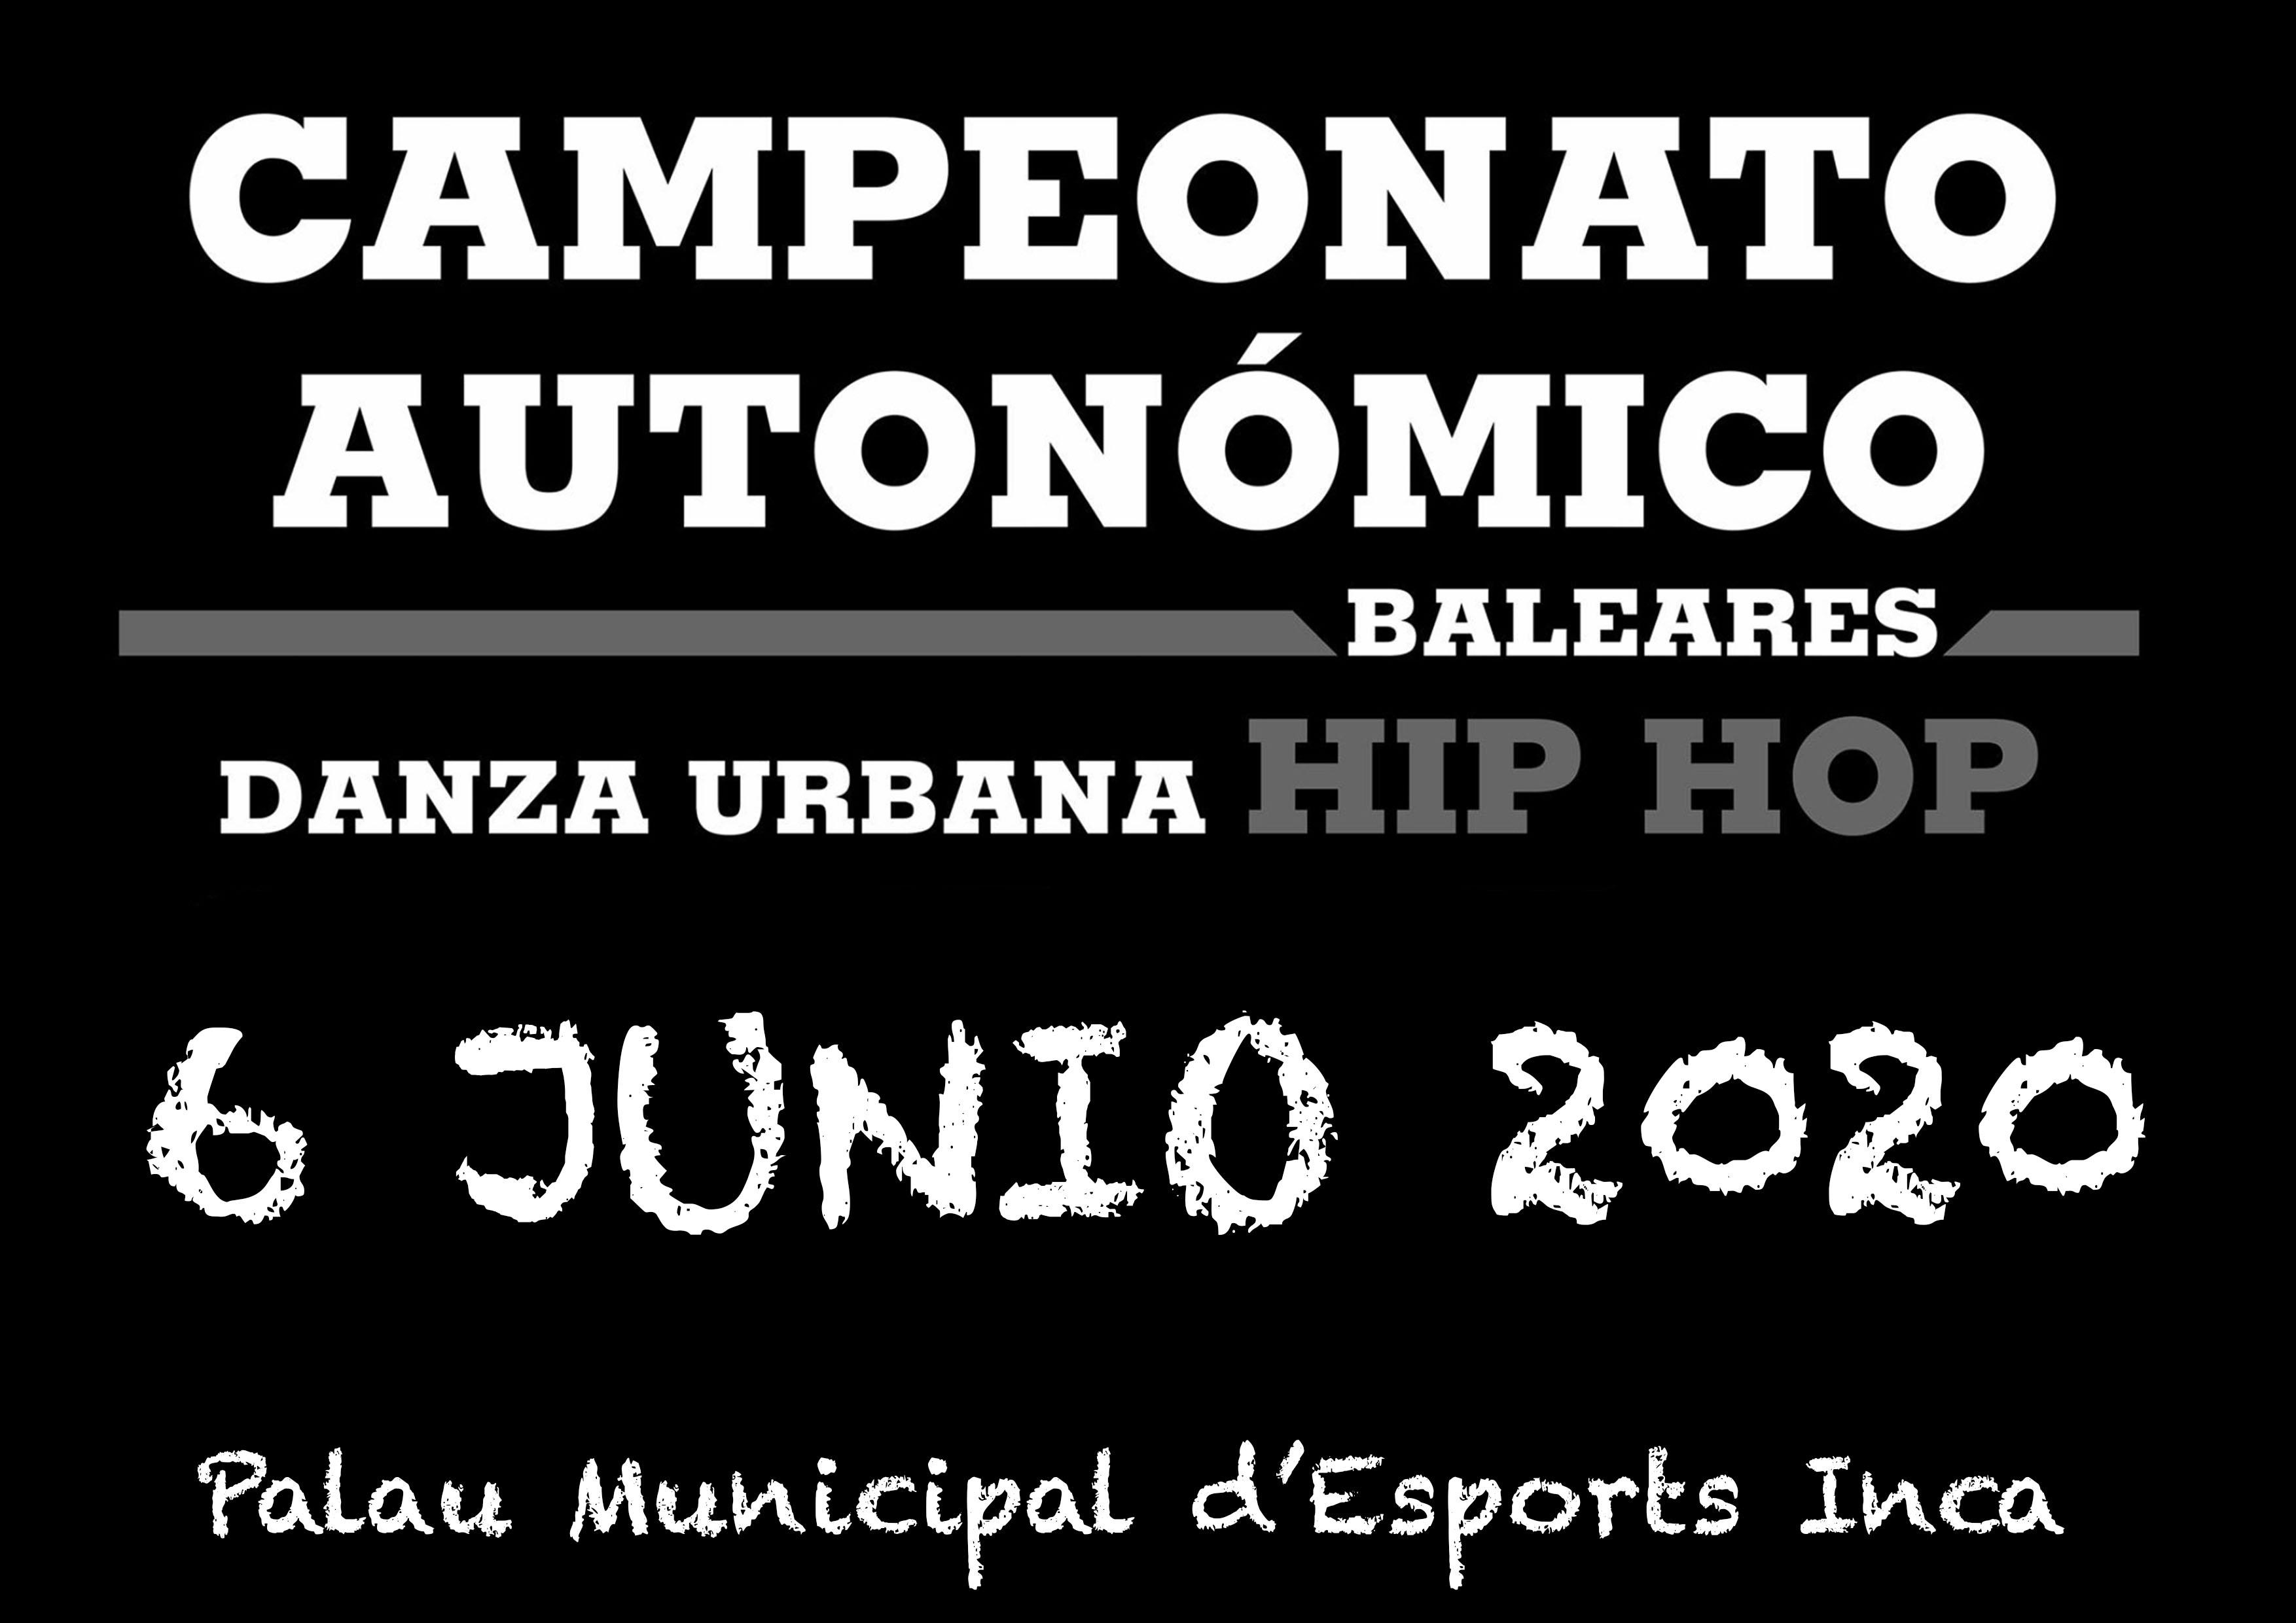 Campeonato Autonómico Danza Urbana Hip Hop 2020